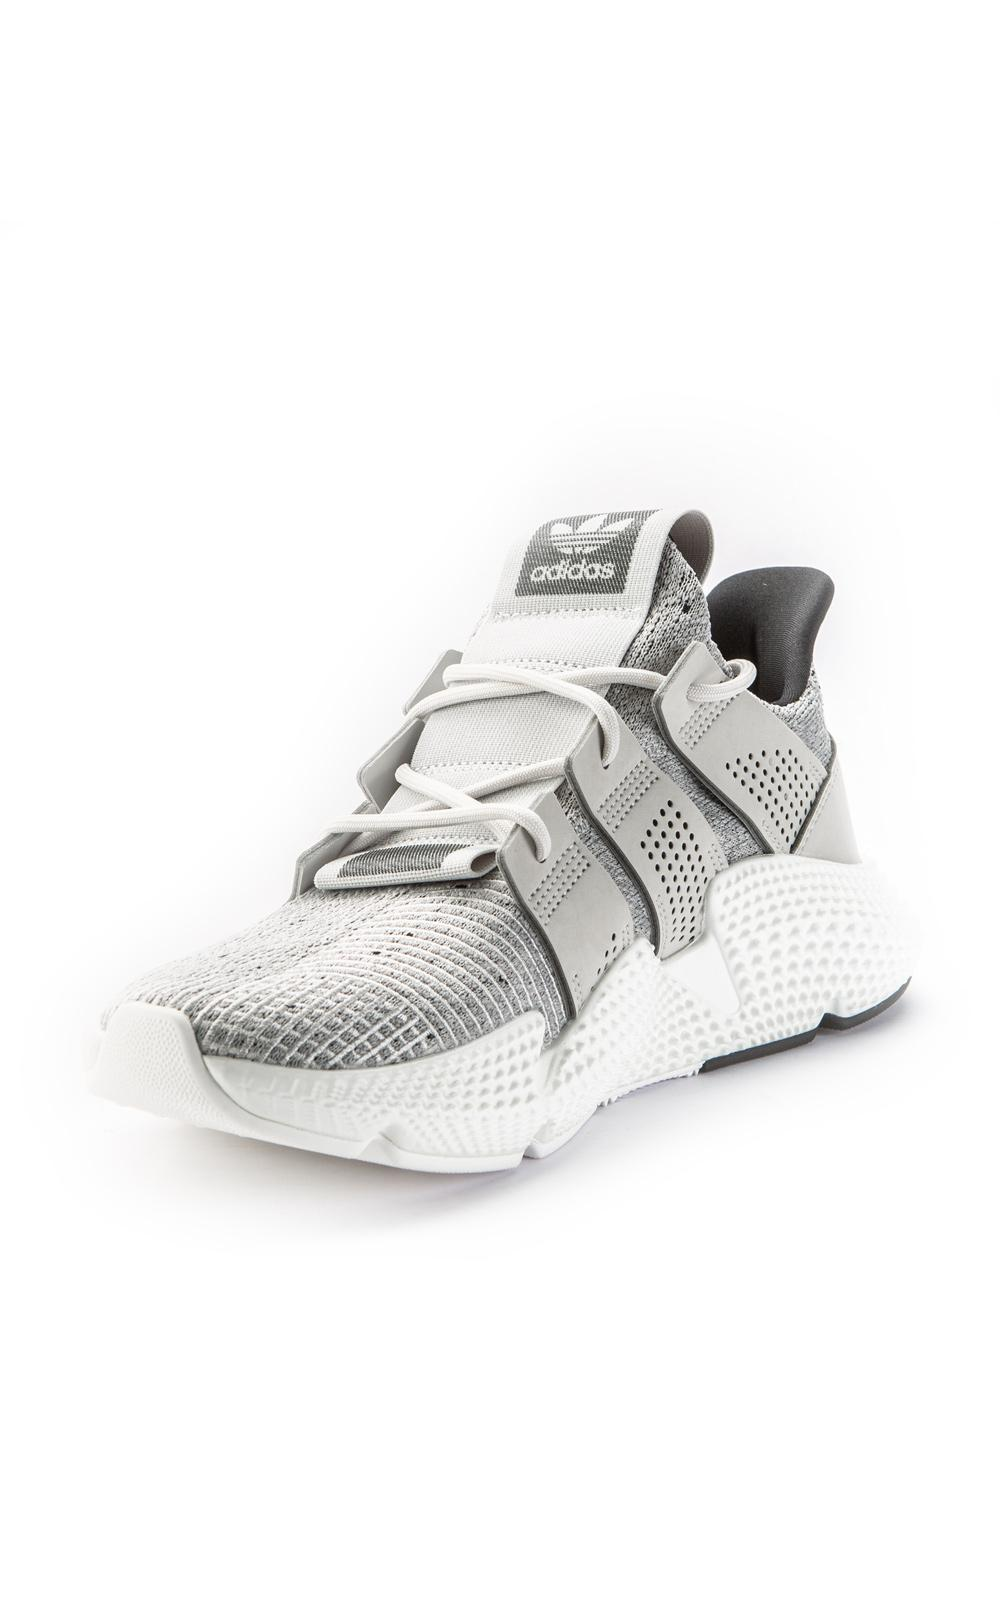 adidas Originals Leather Prophere Grey/black in Grey for Men